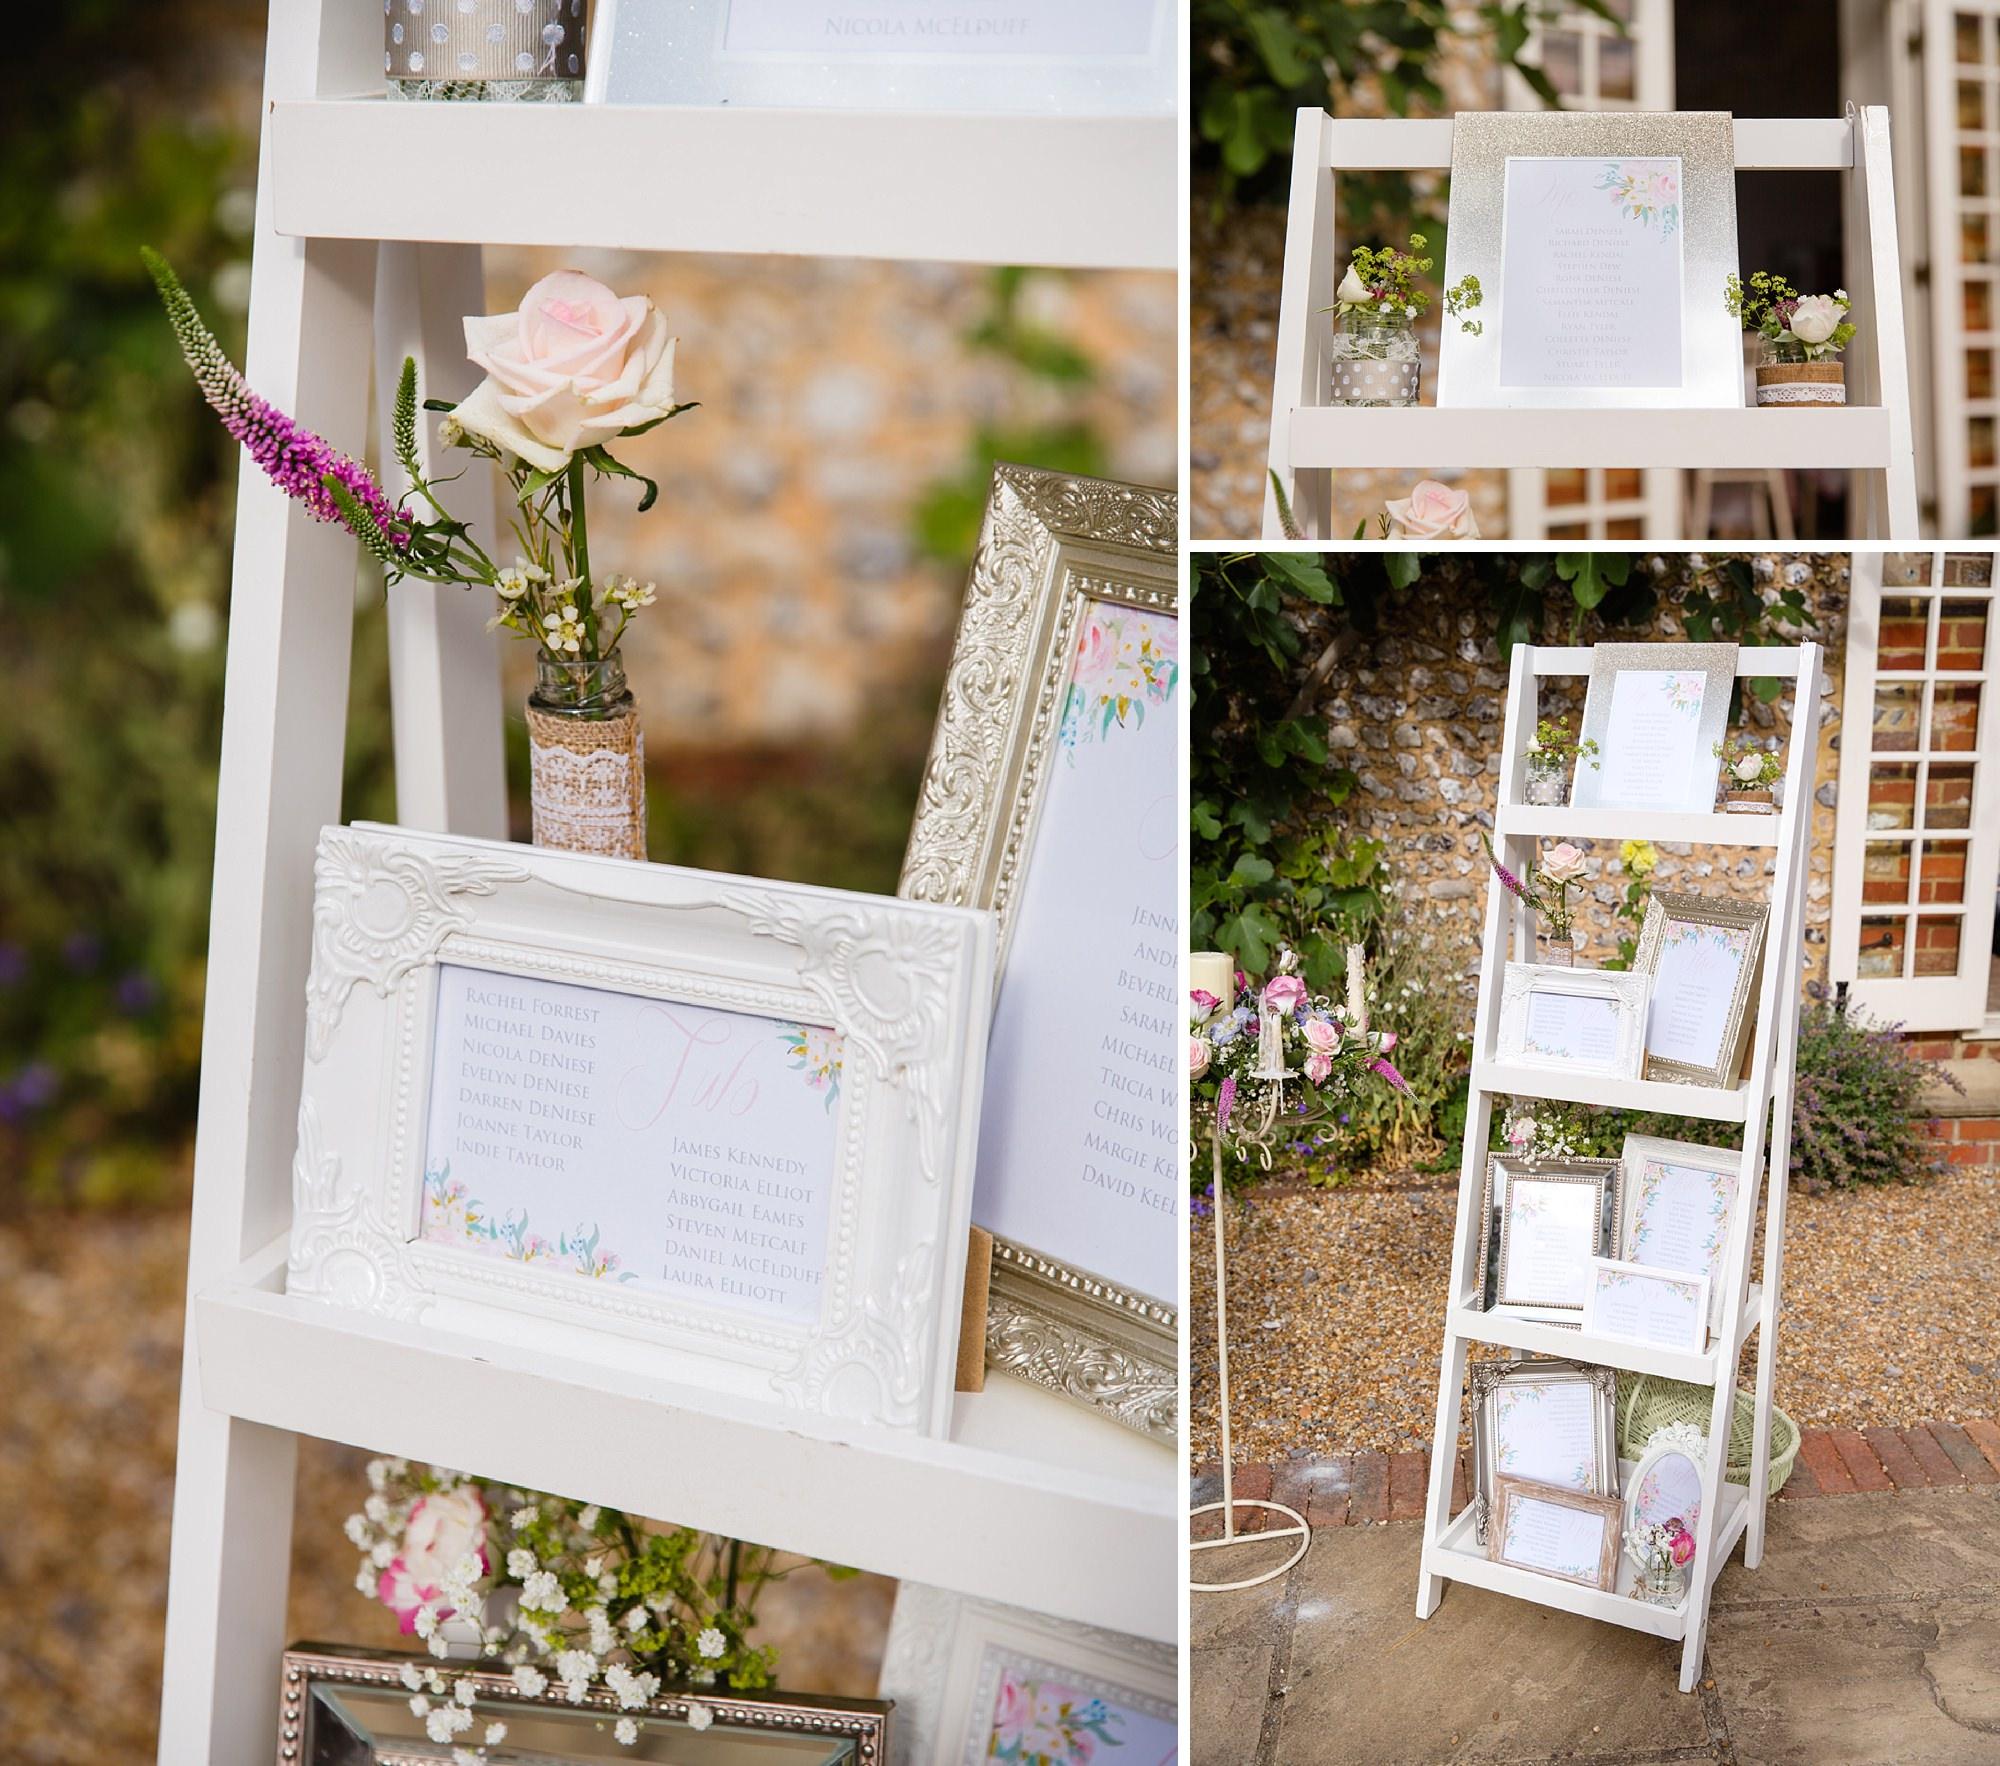 Bignor Park wedding photography table plan